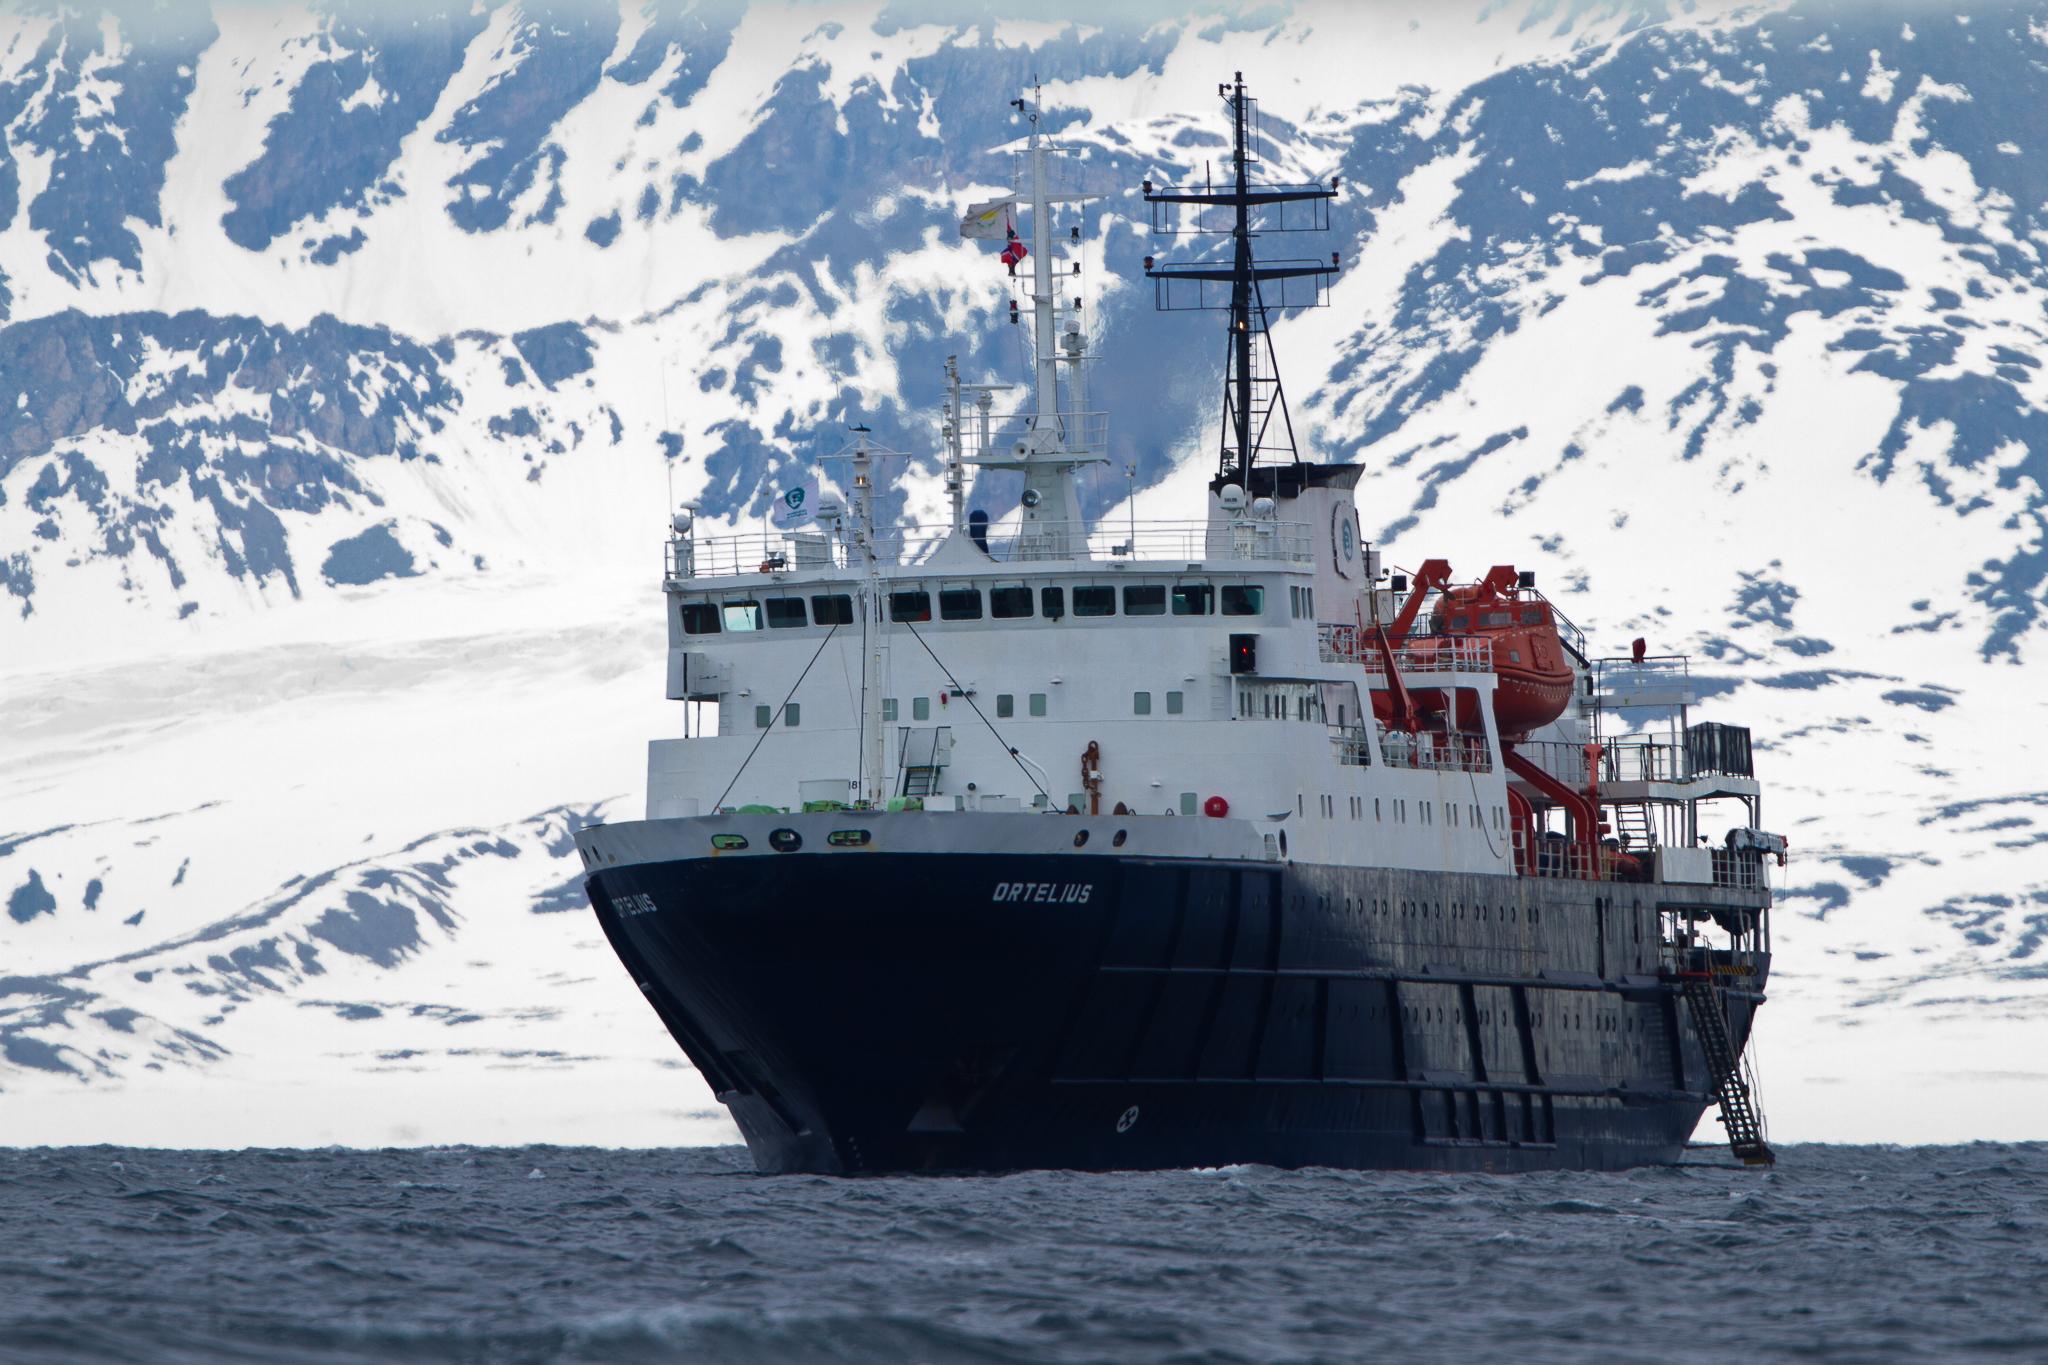 The Ortelius ~ Poolepynten, Svalbard